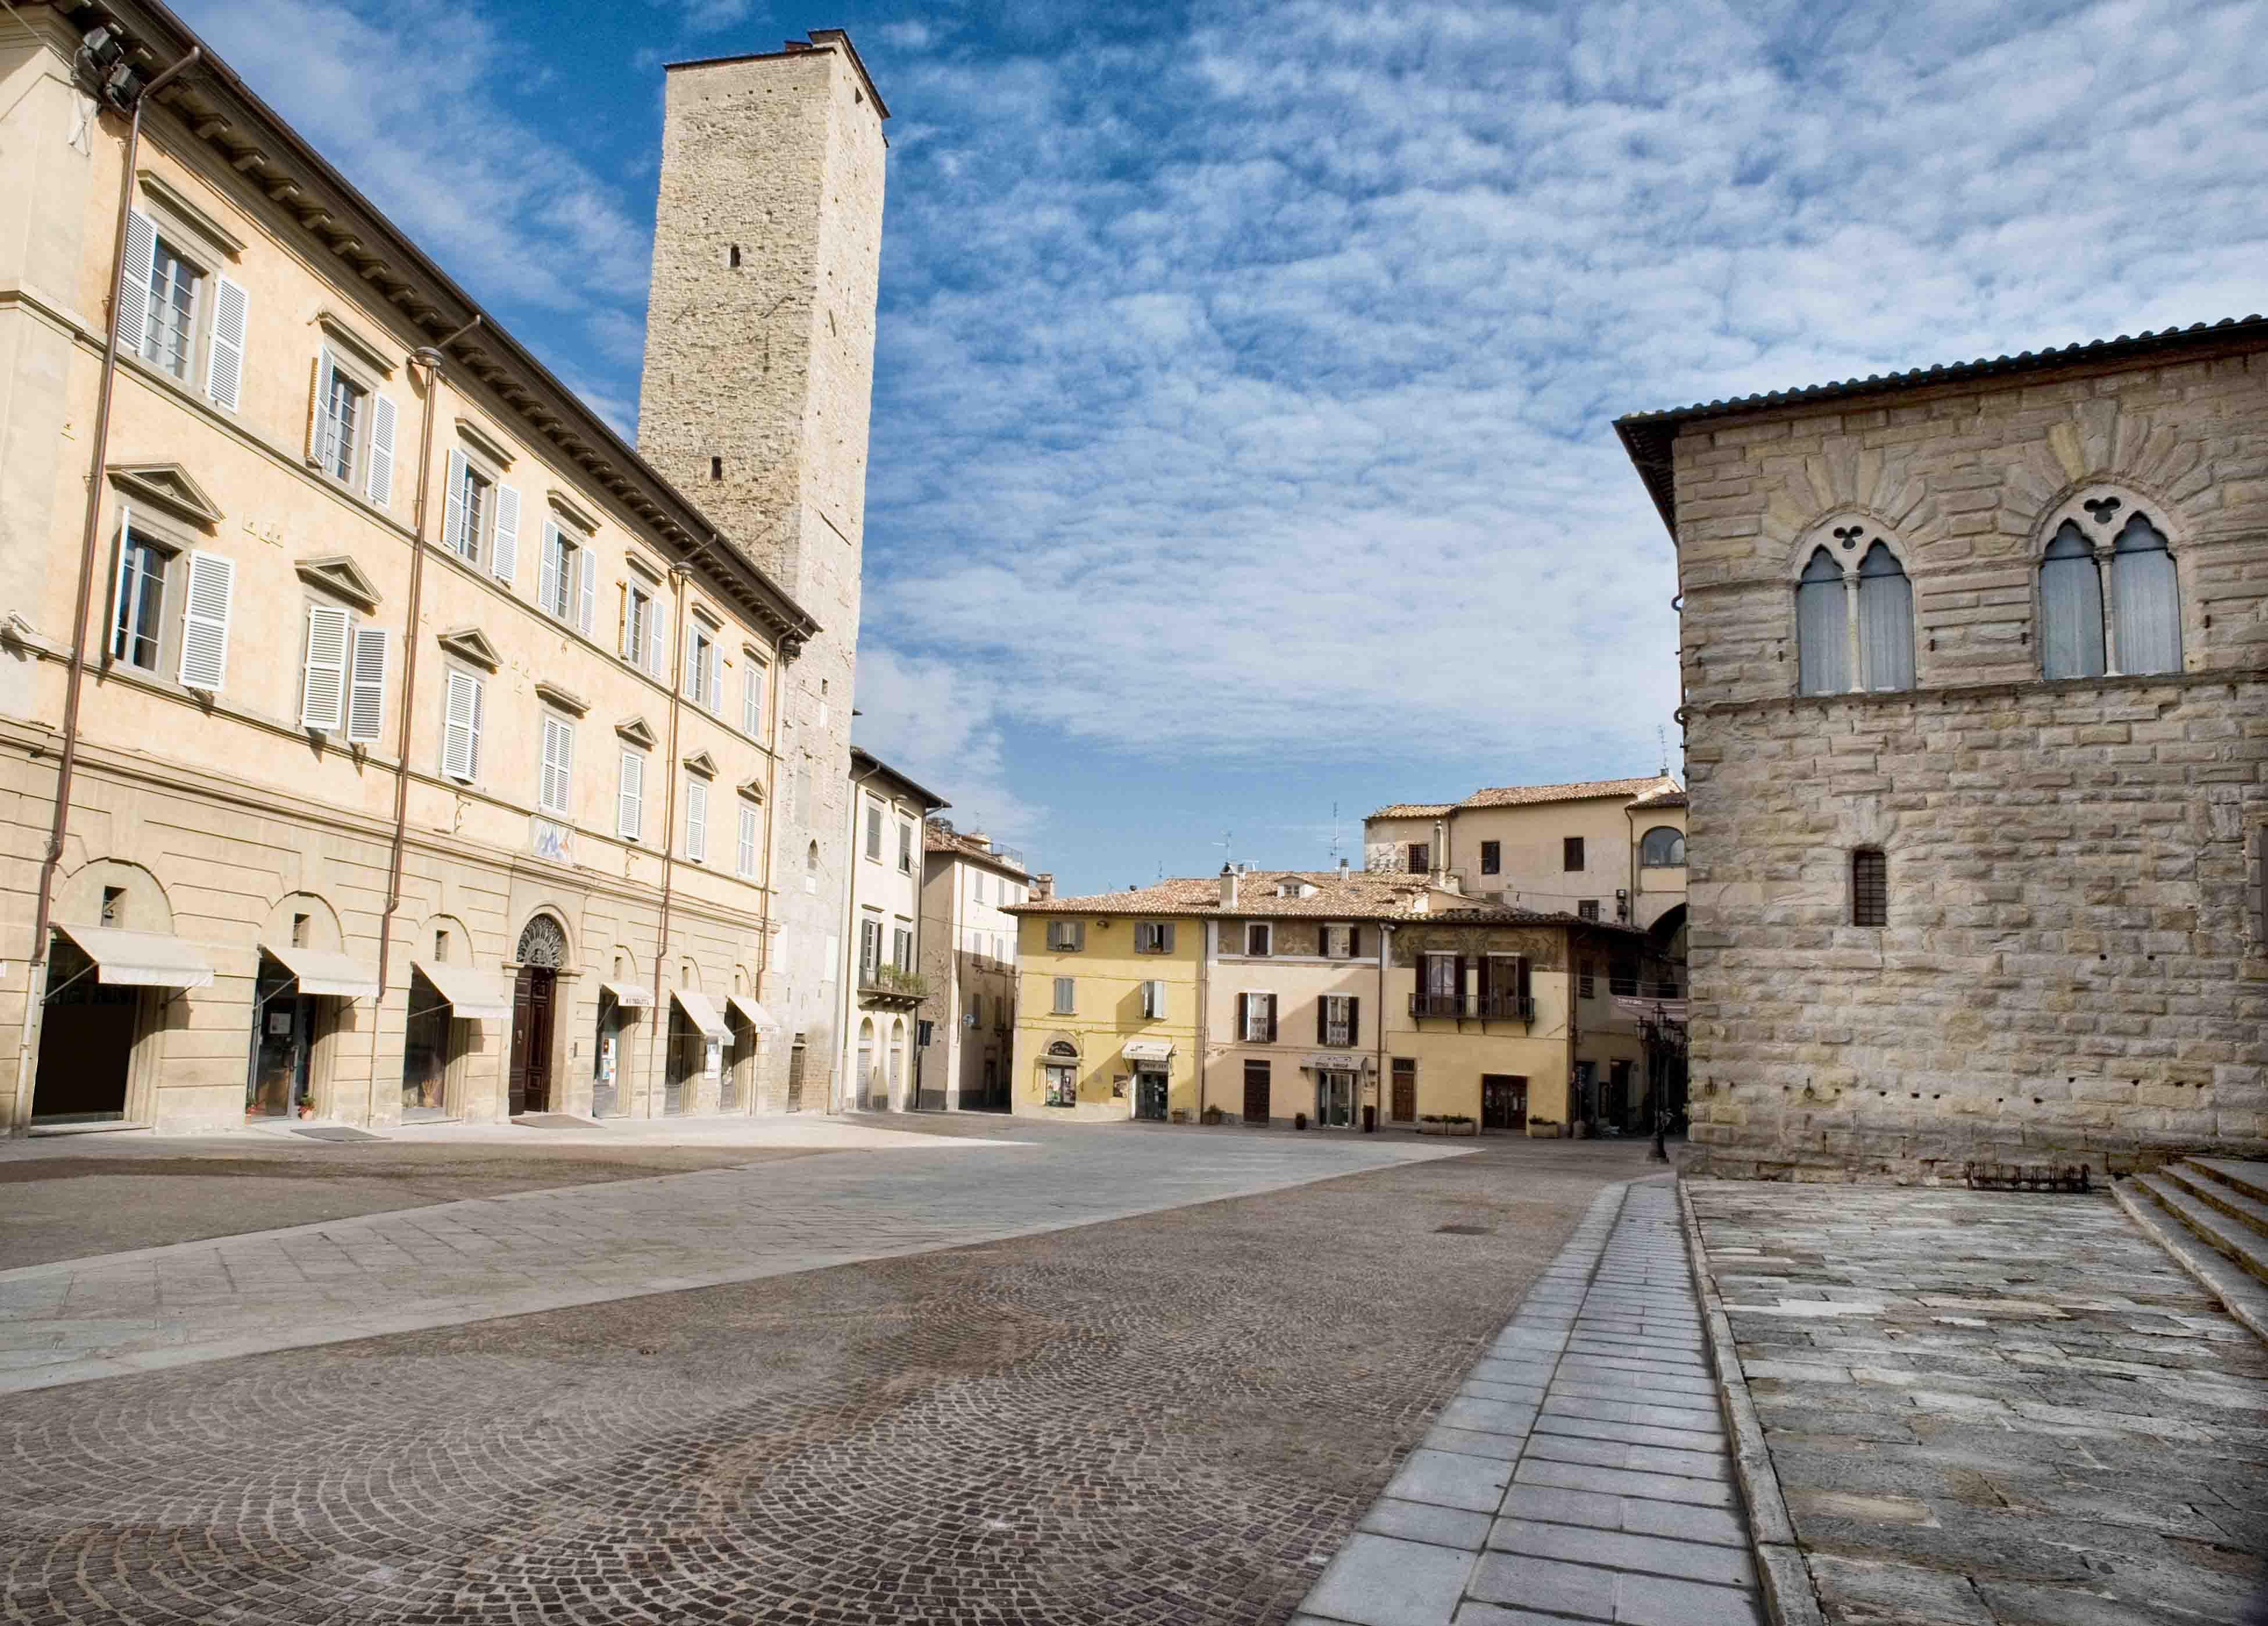 Piazza Gabriotti